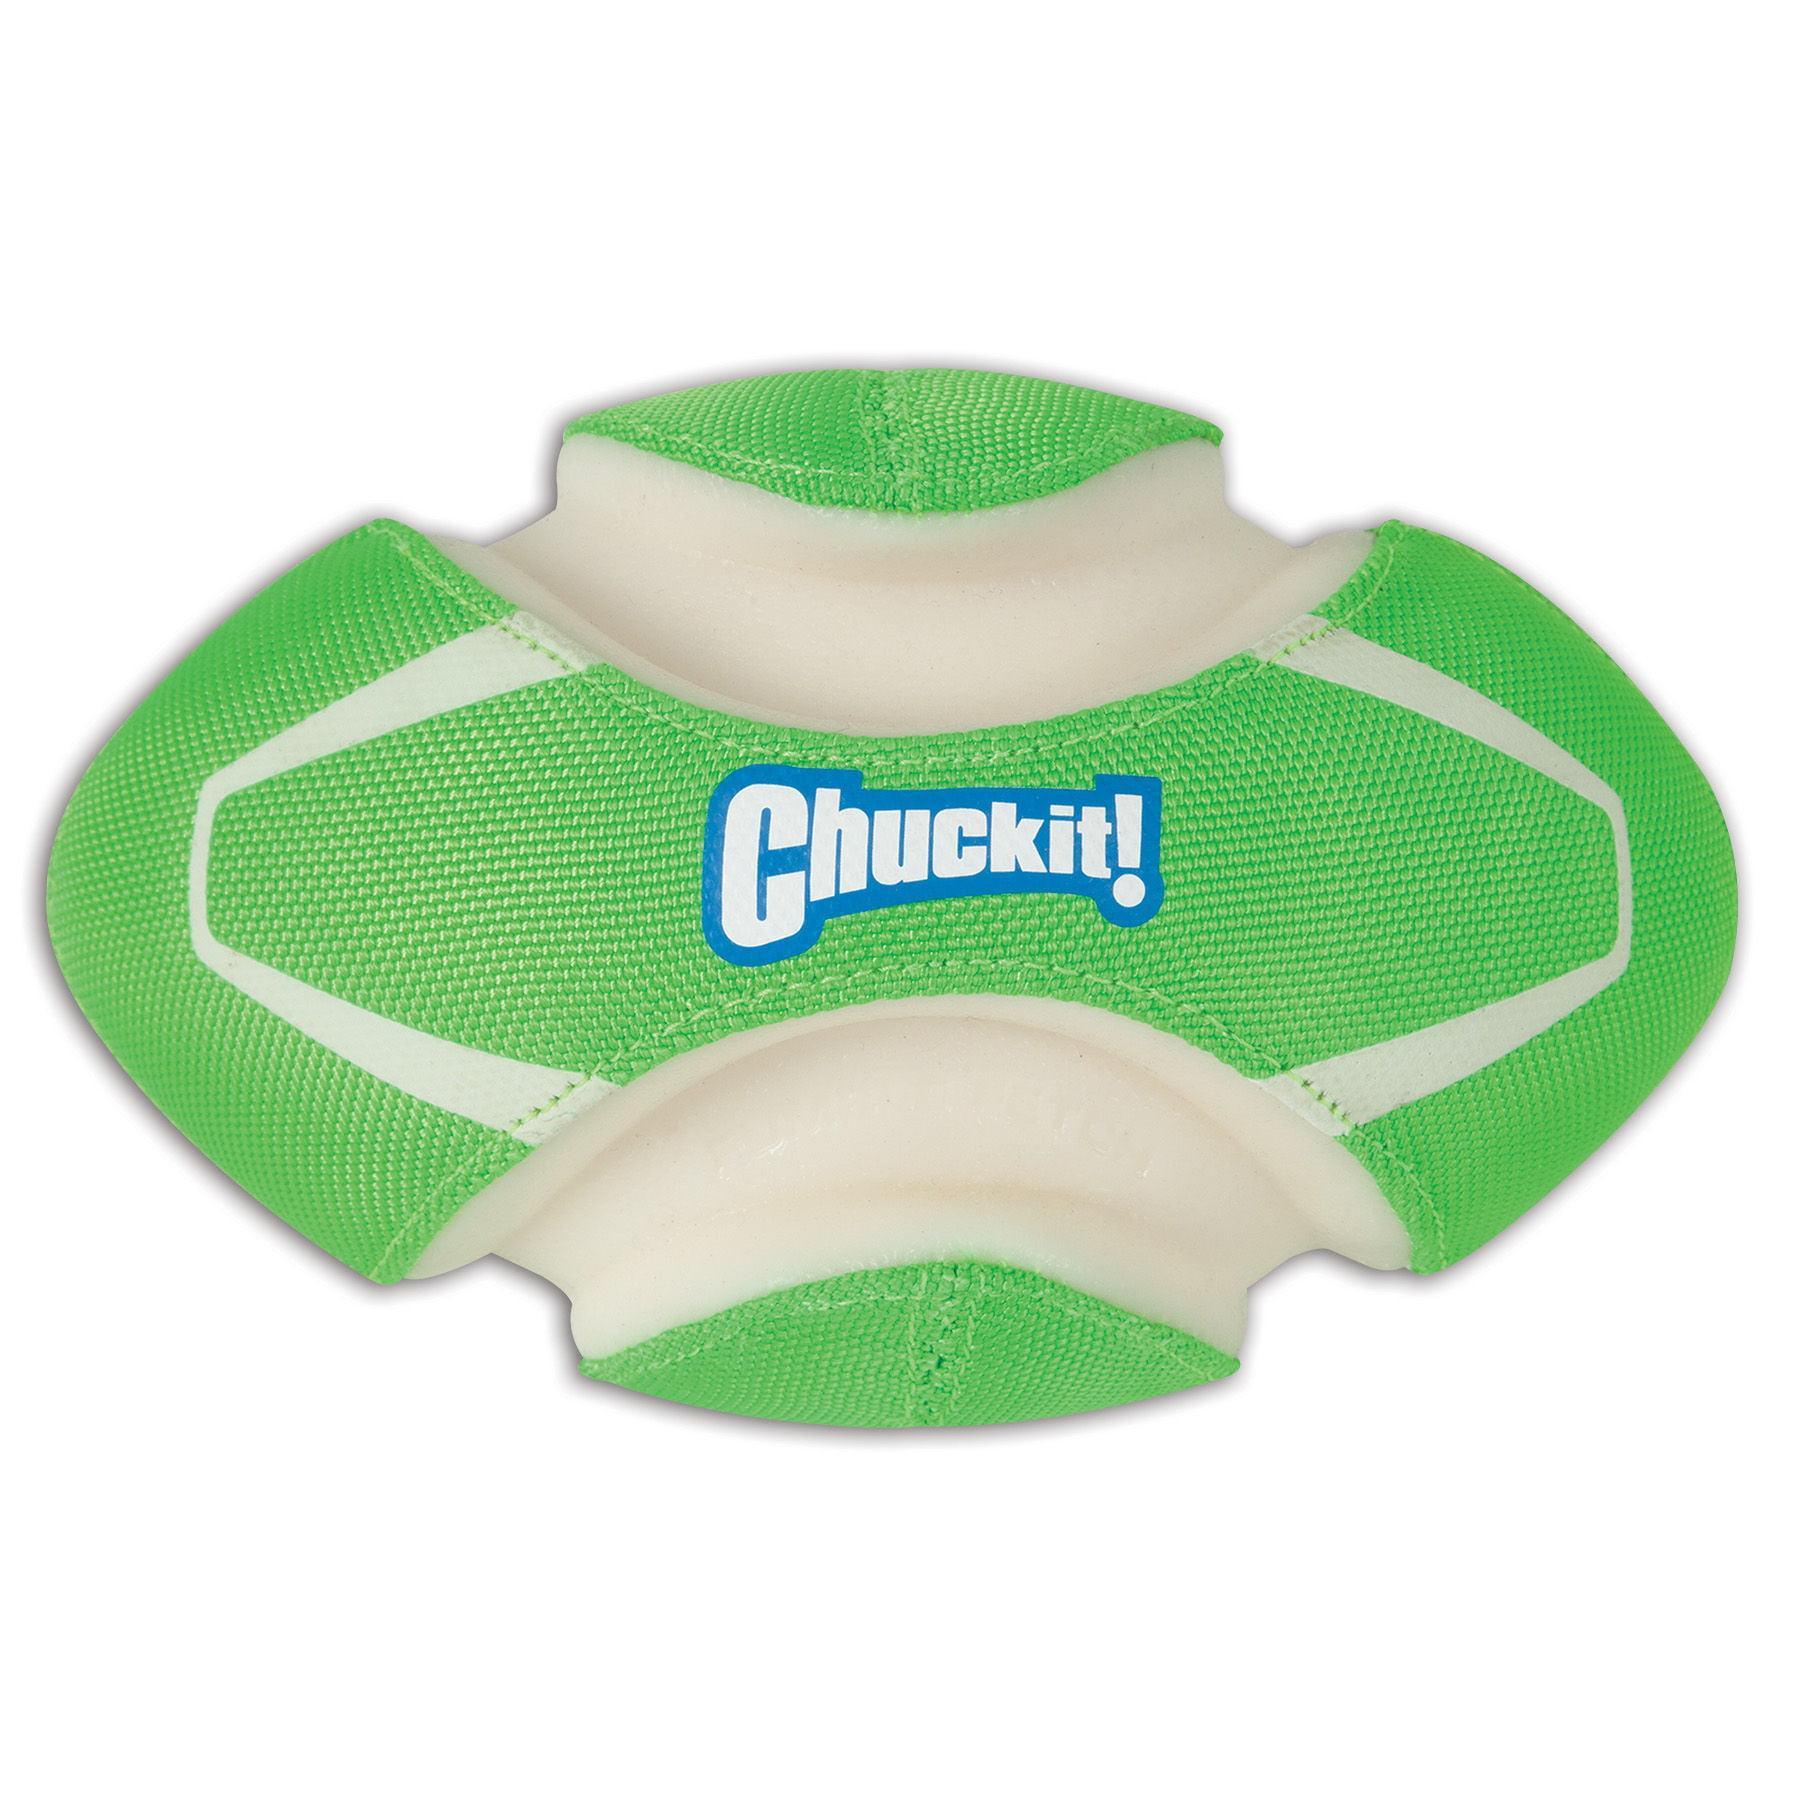 Chuckit! Fumble Fetch Max Glow Dog toy